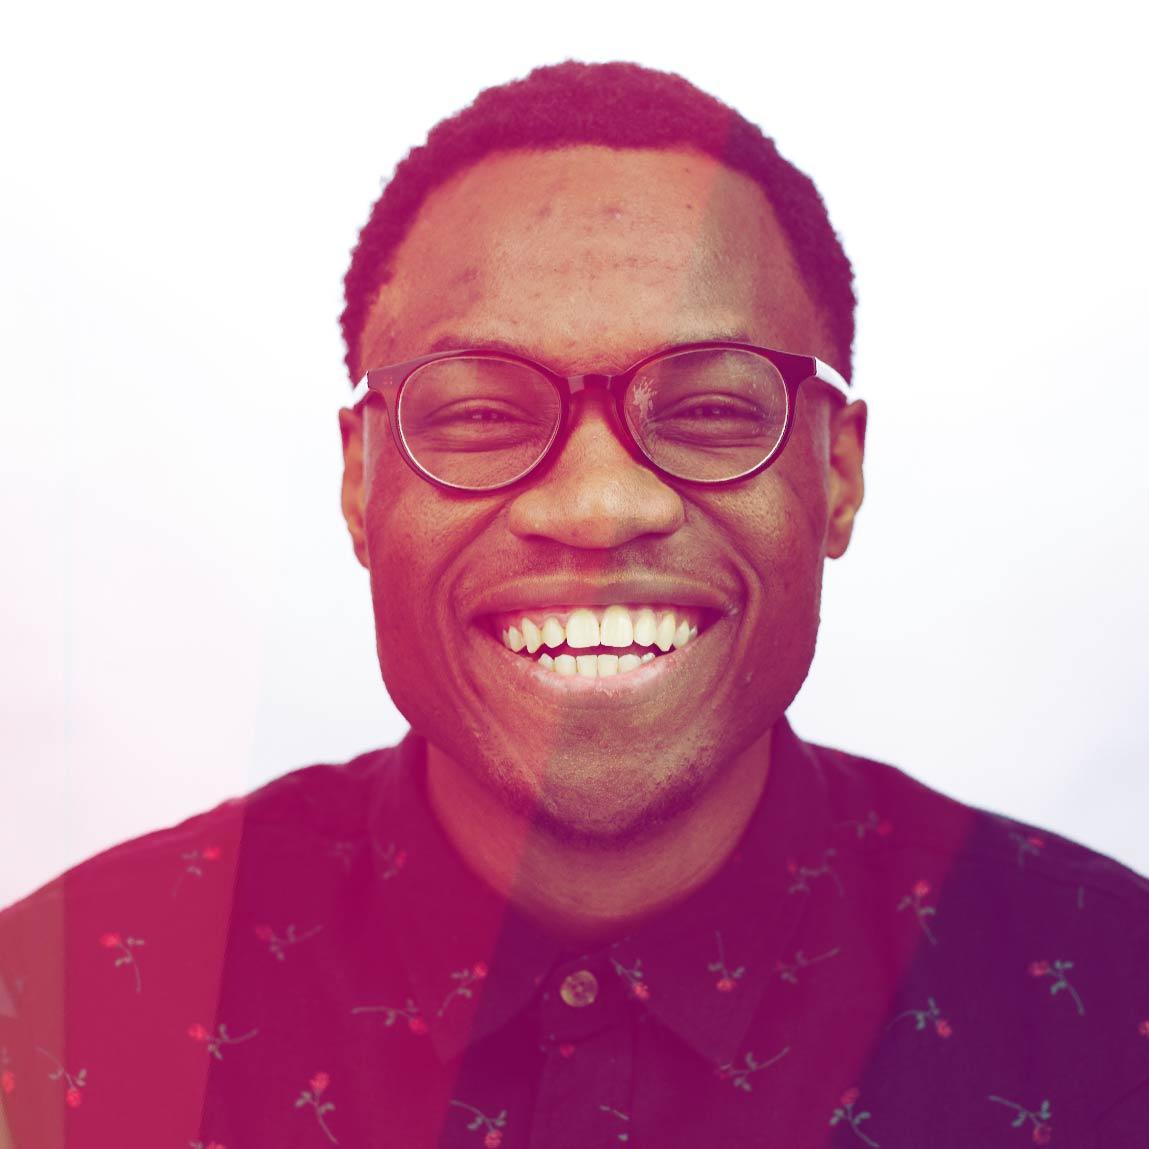 FG Portraits - Young African American Man w Glasses.jpg